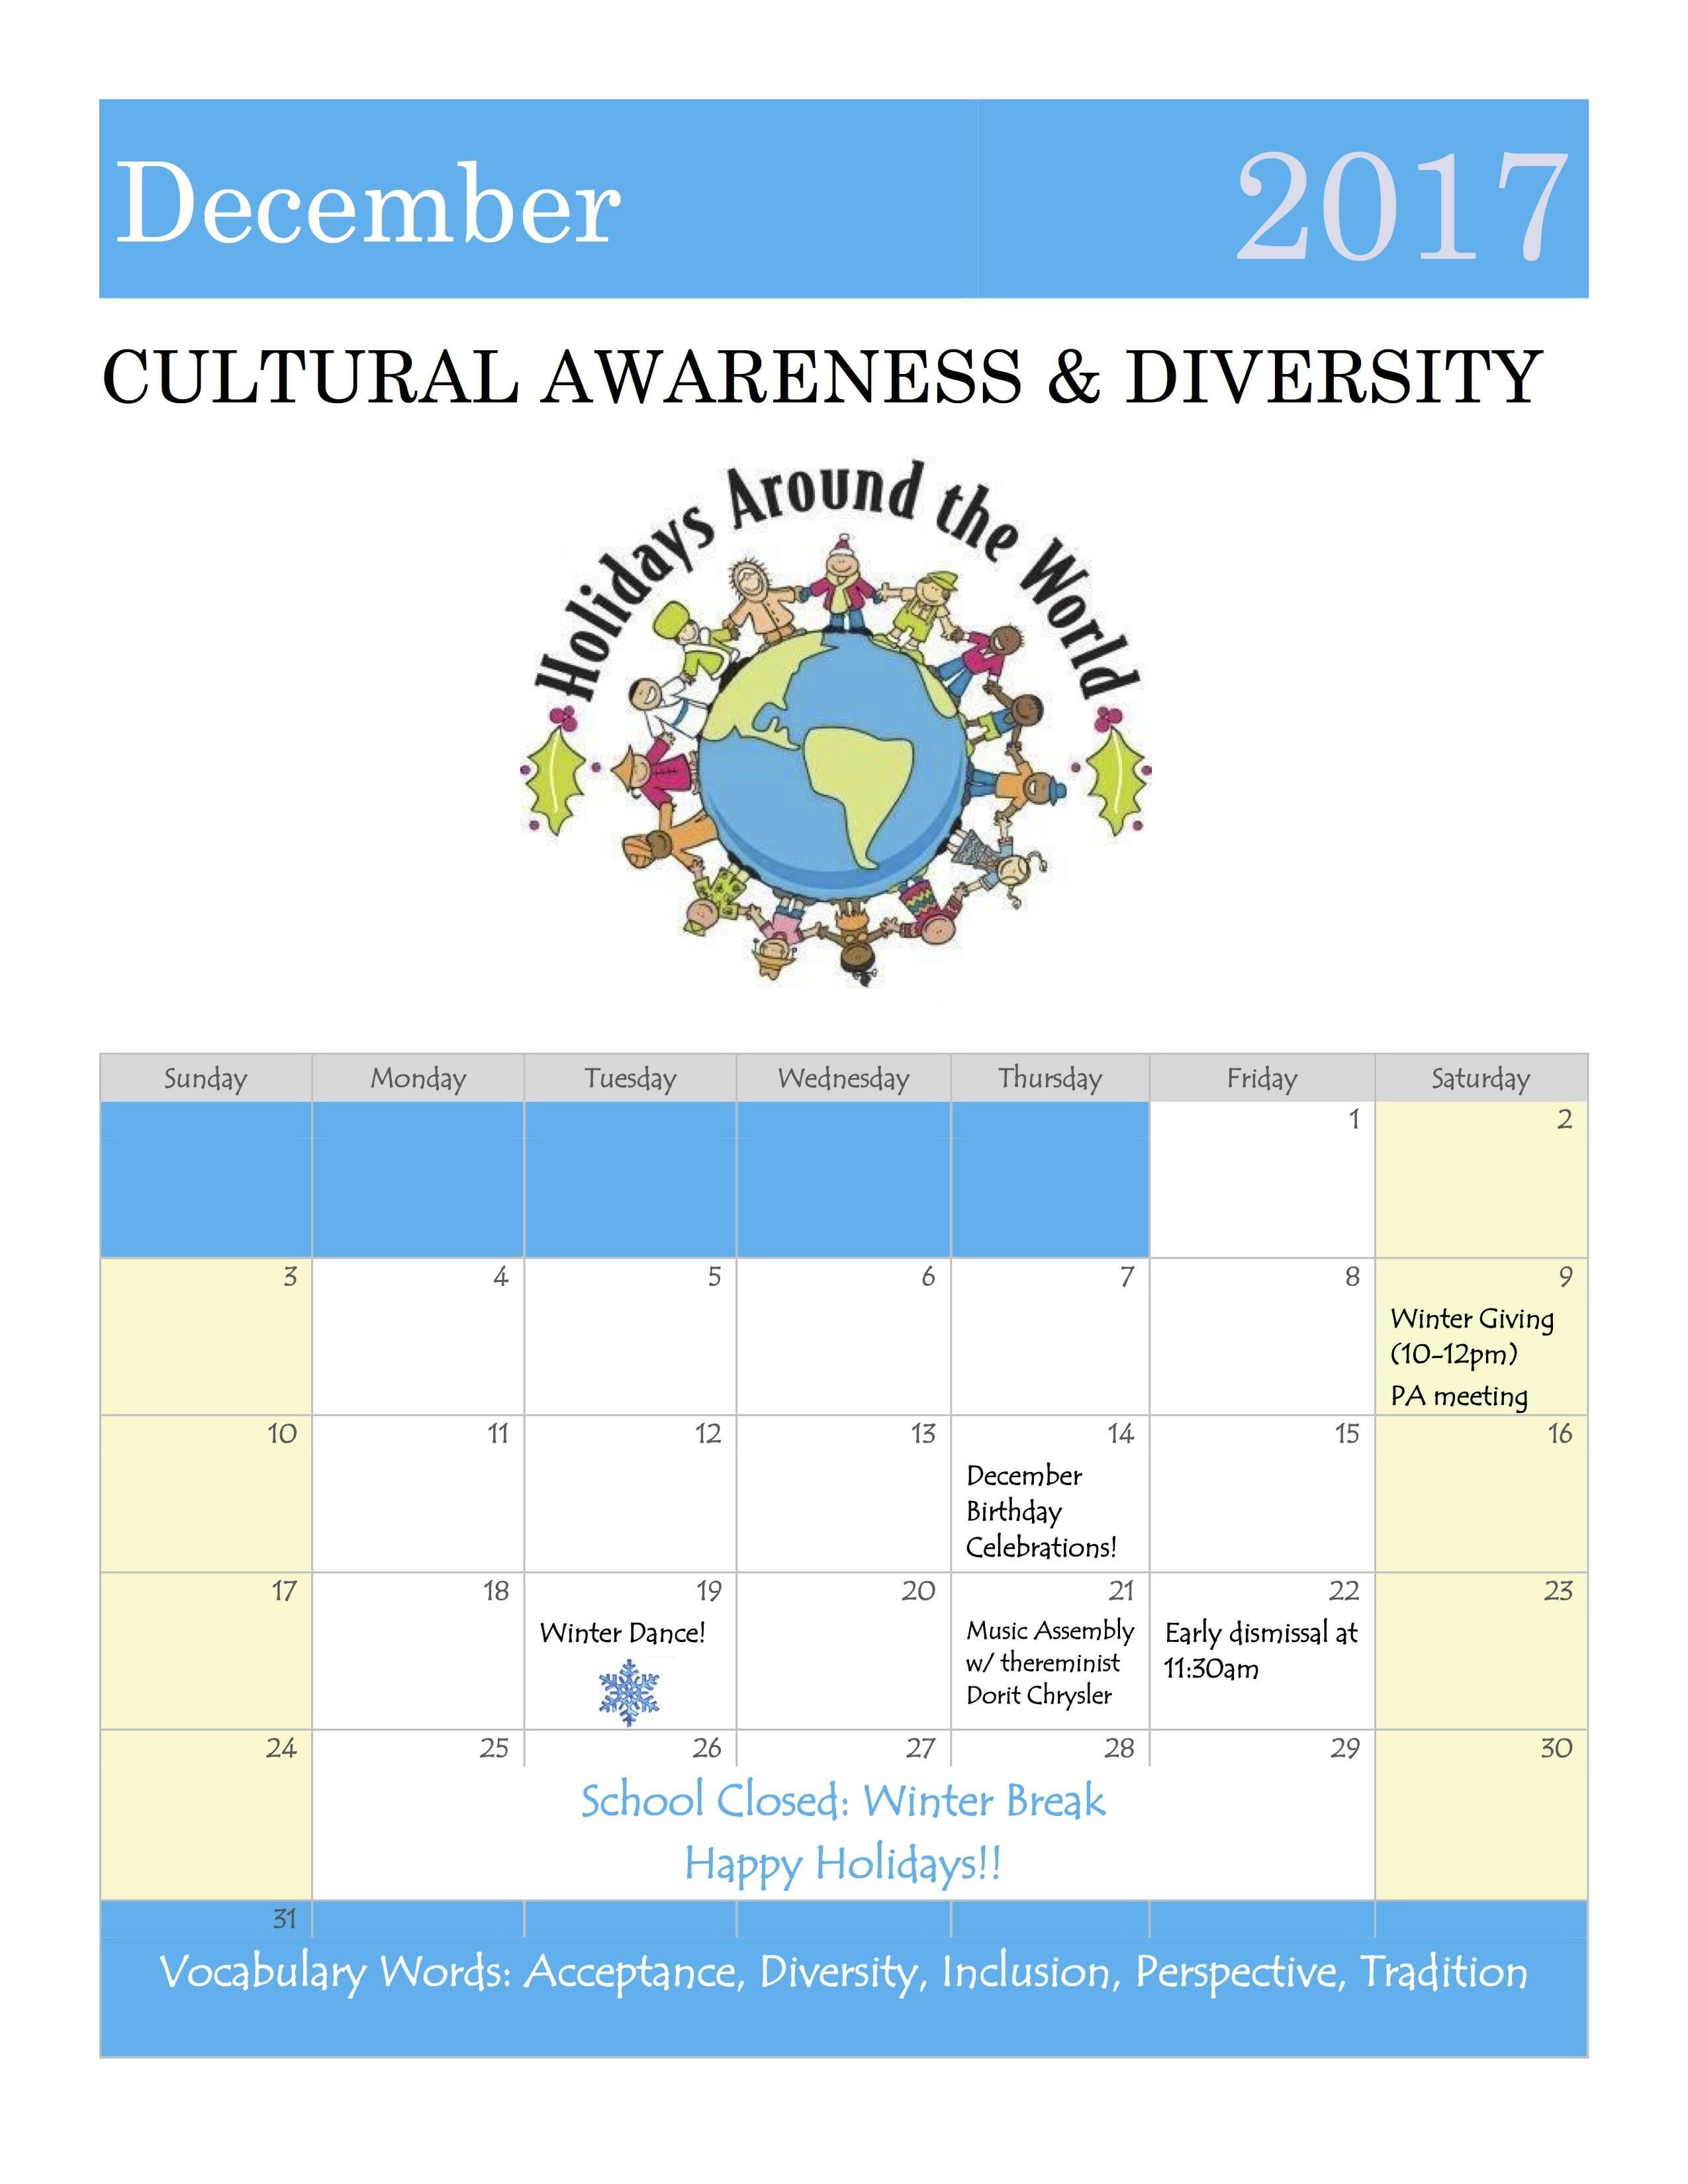 December Is Cultural Awareness Amp Diversity Month